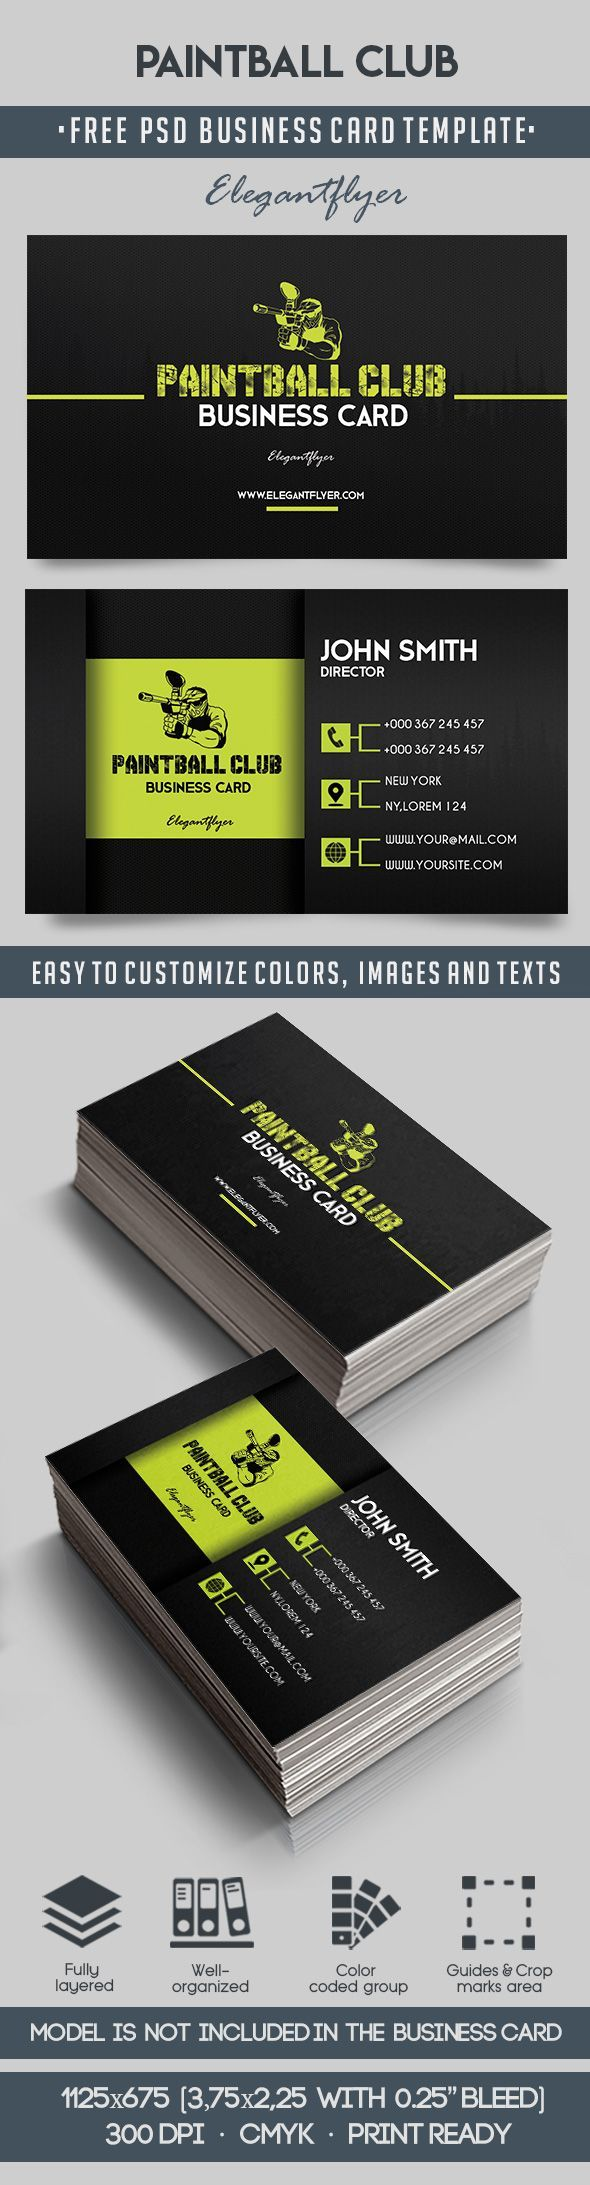 Httpselegantflyerfree business cards templatepaintball paintball club free business card templates psd accmission Choice Image